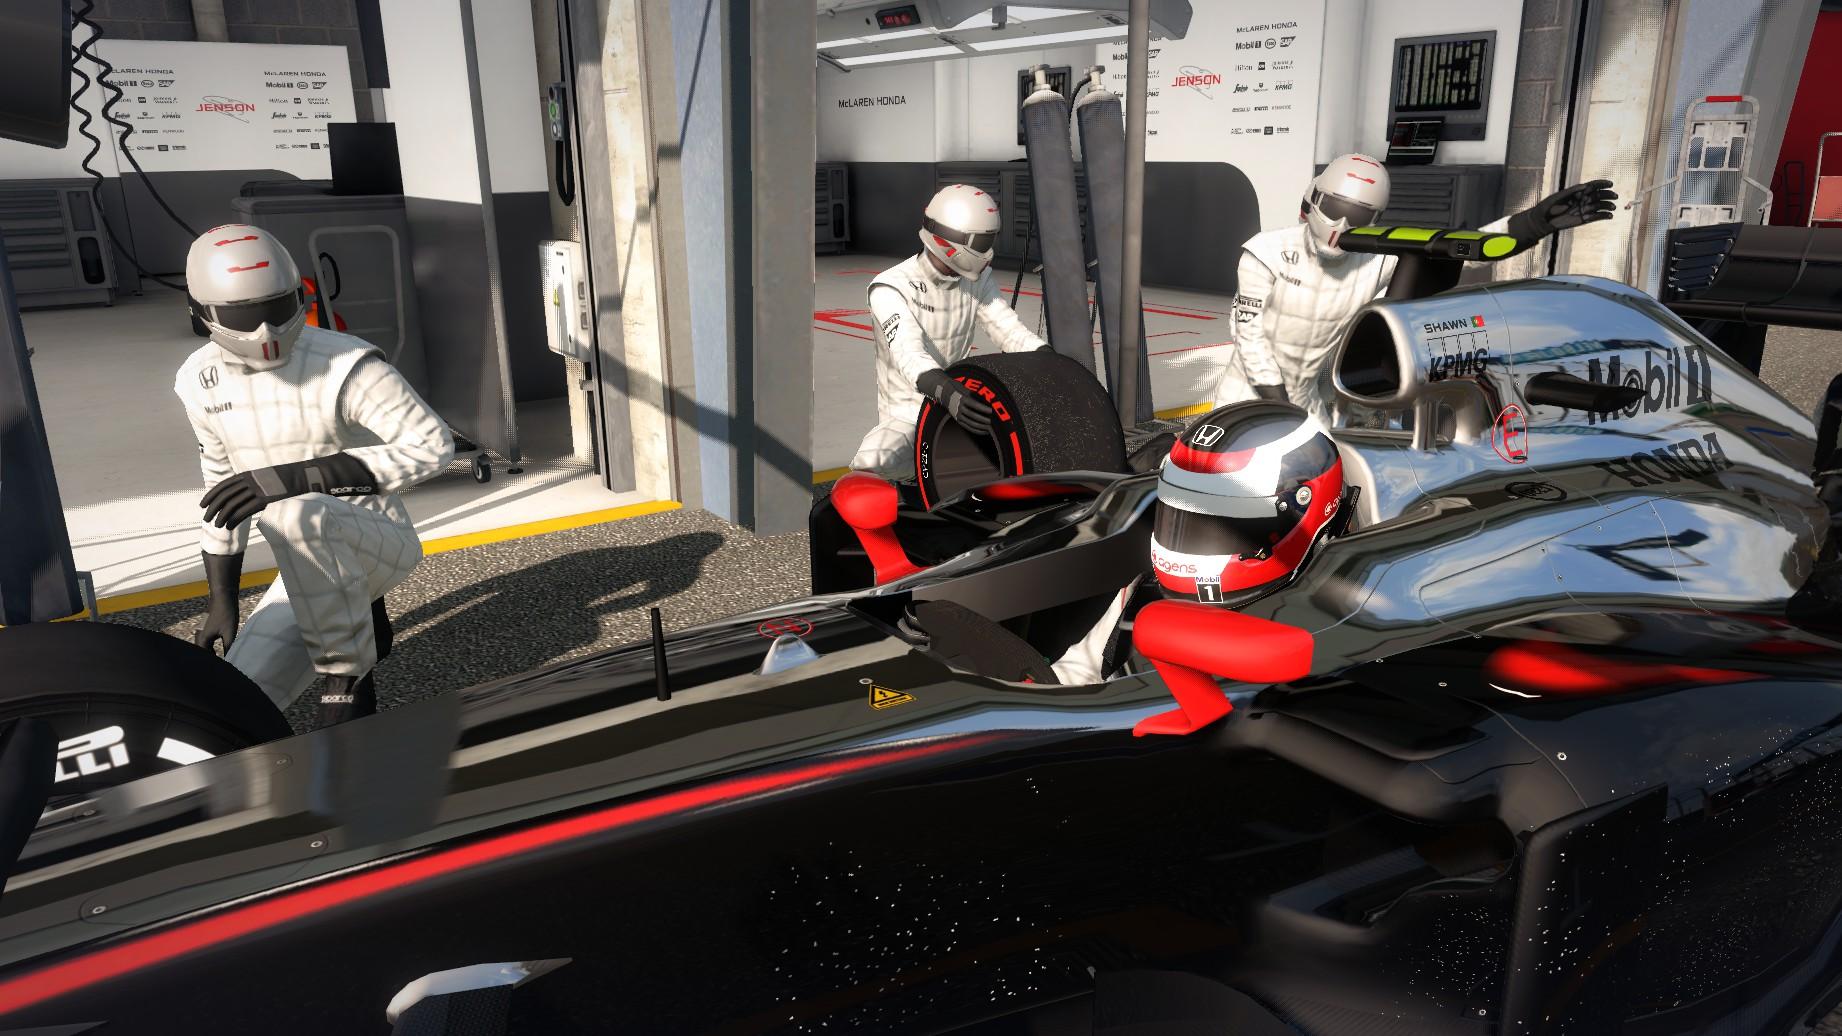 McLaren Honda's pit.